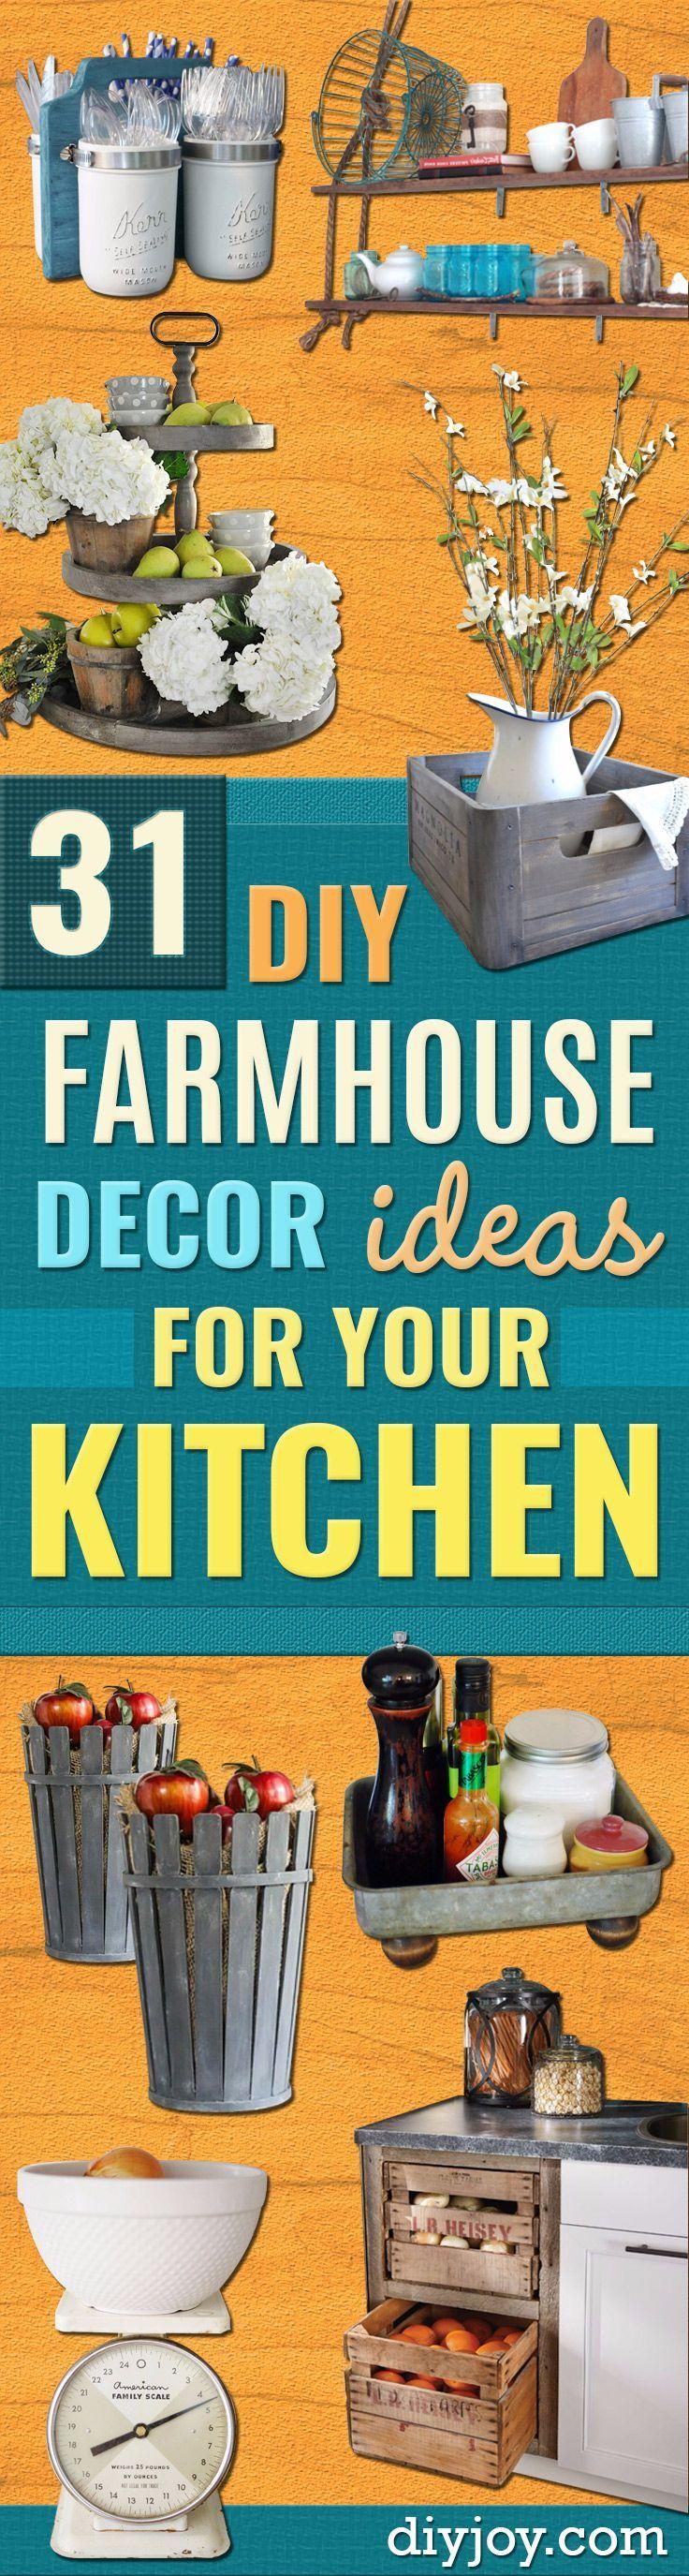 best kitchen it images on pinterest